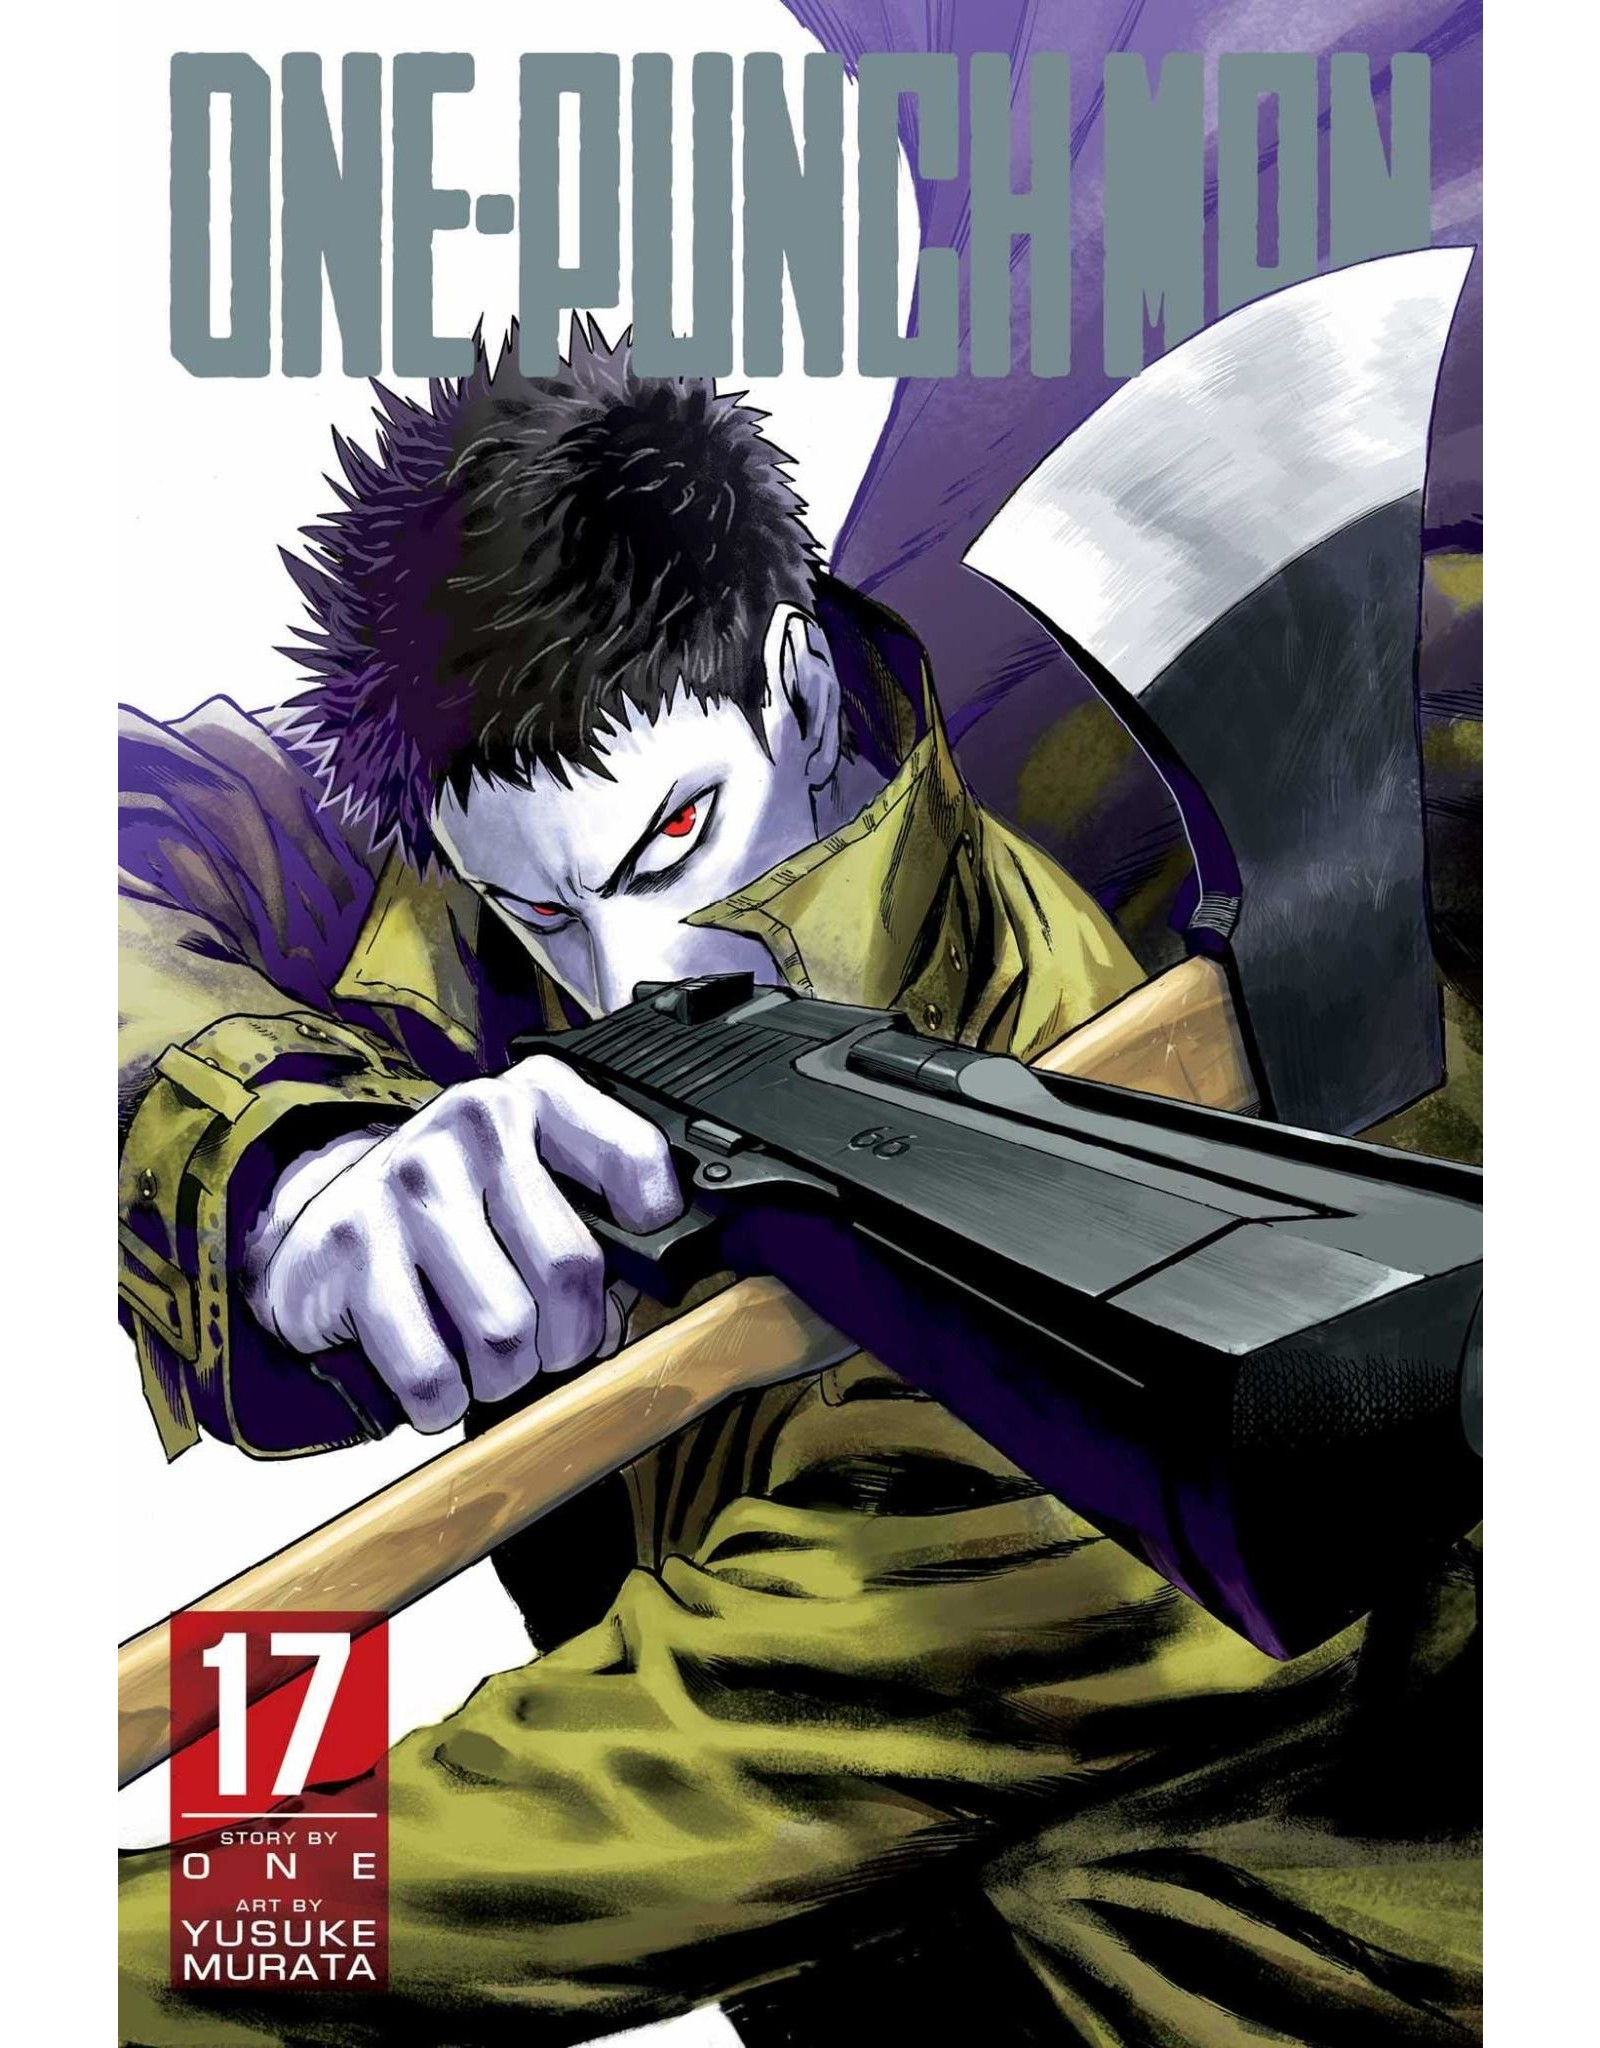 One-Punch Man Volume 17 (English Version)